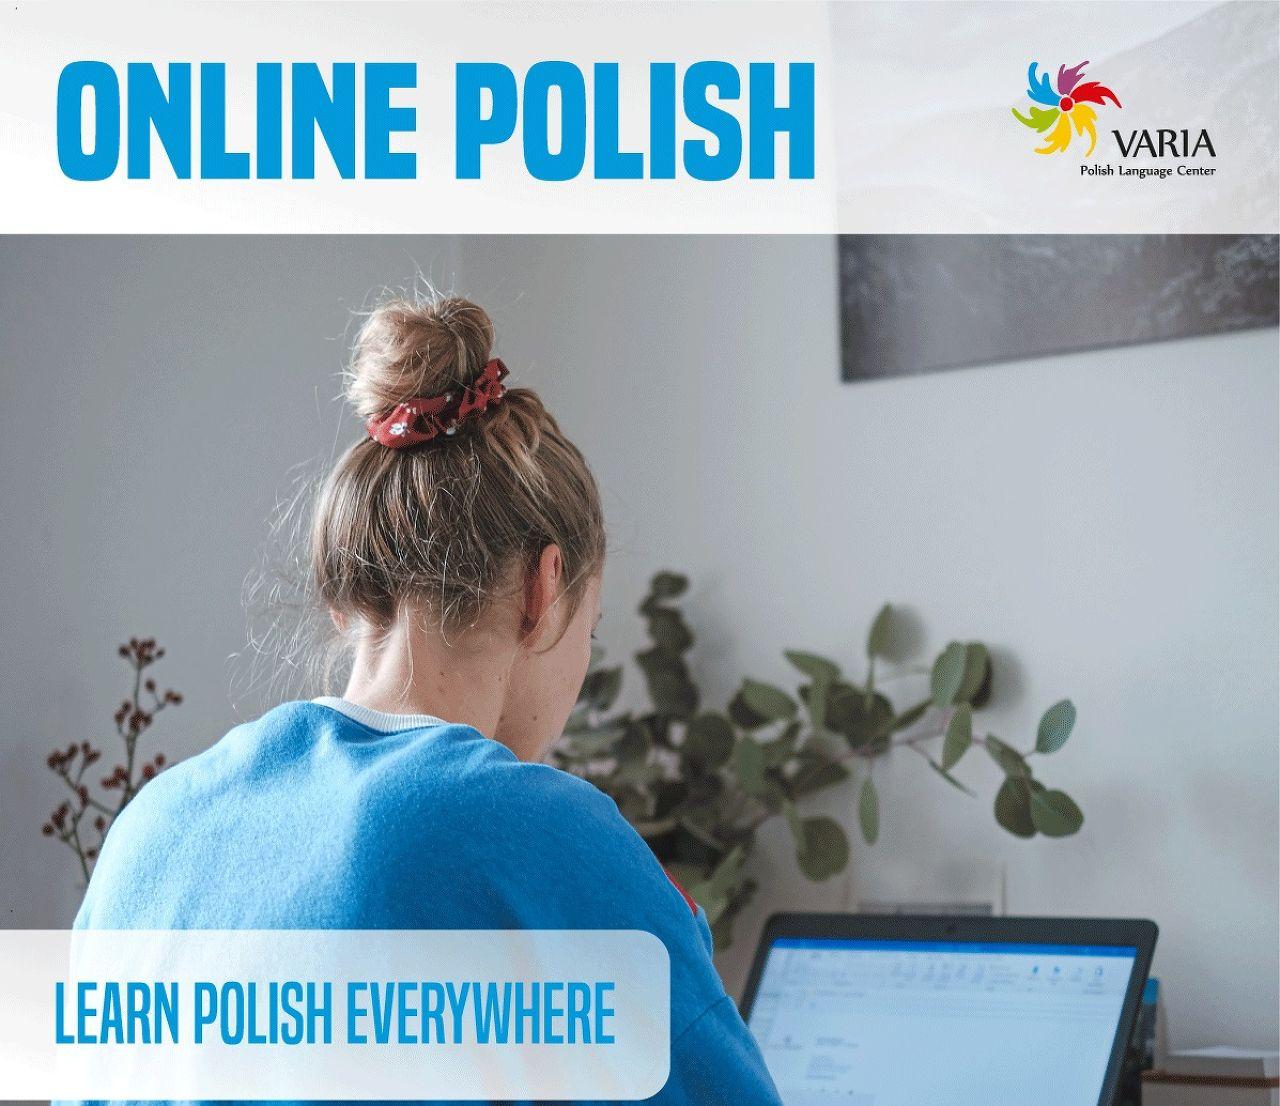 Online Polish Language Semester Course at VARIA